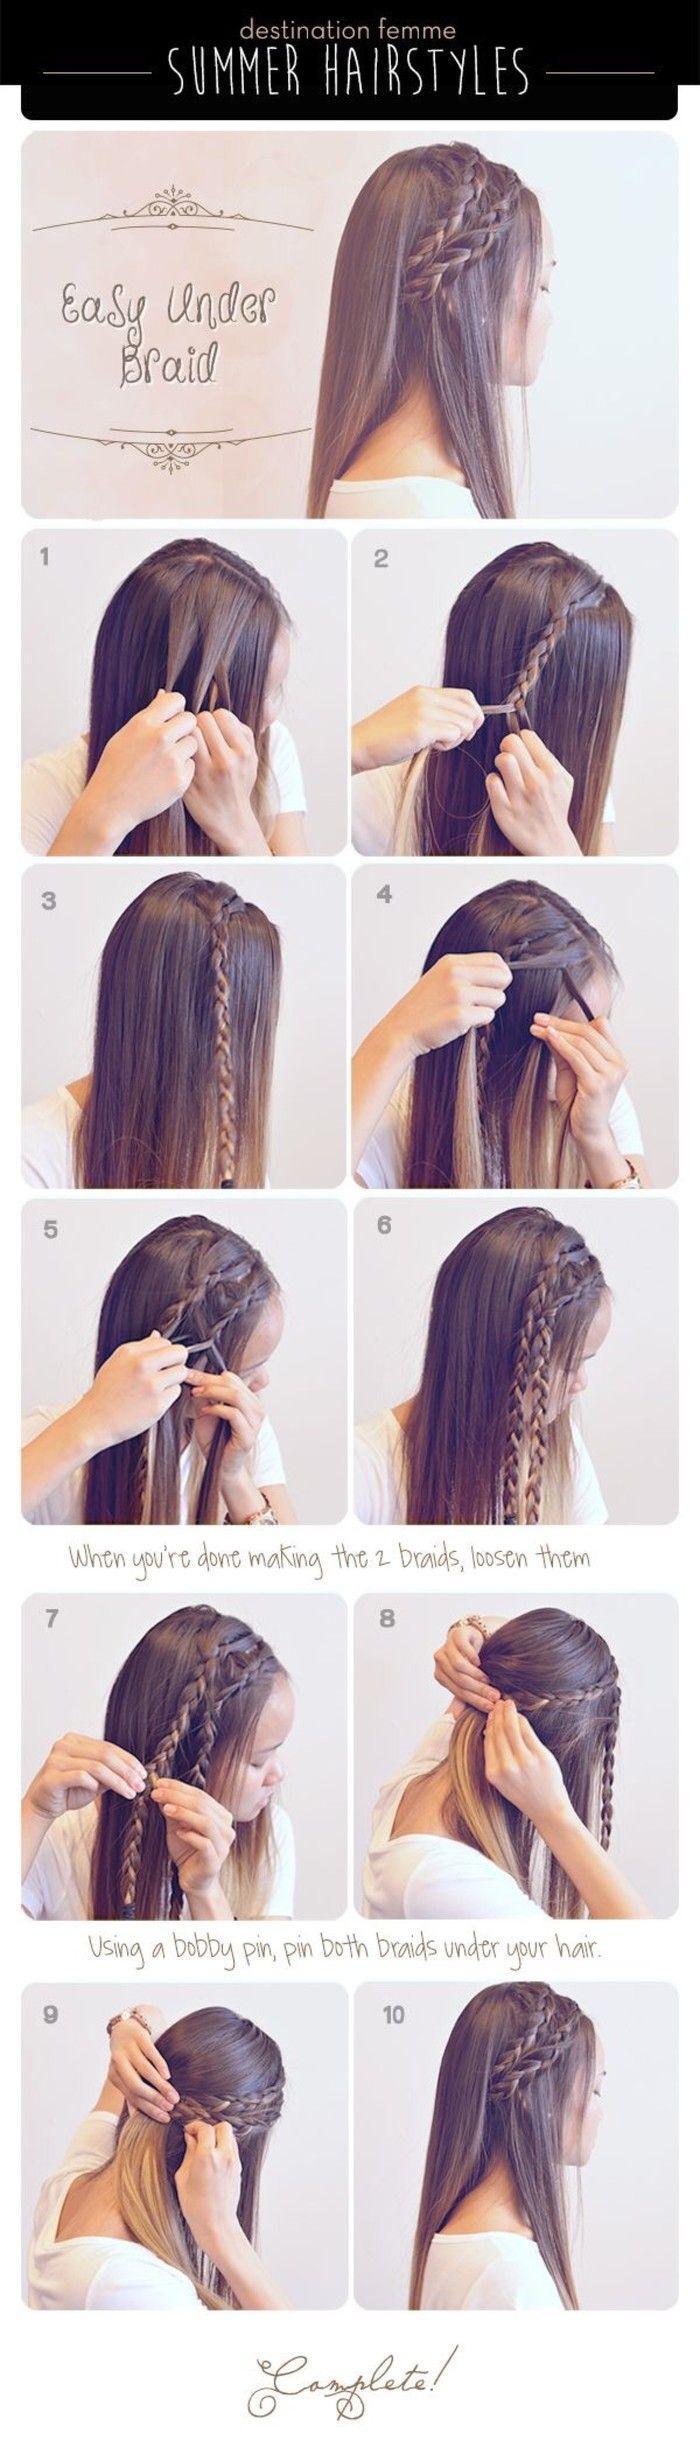 Easy hairstyle for medium hair hair pinterest easy hairstyles